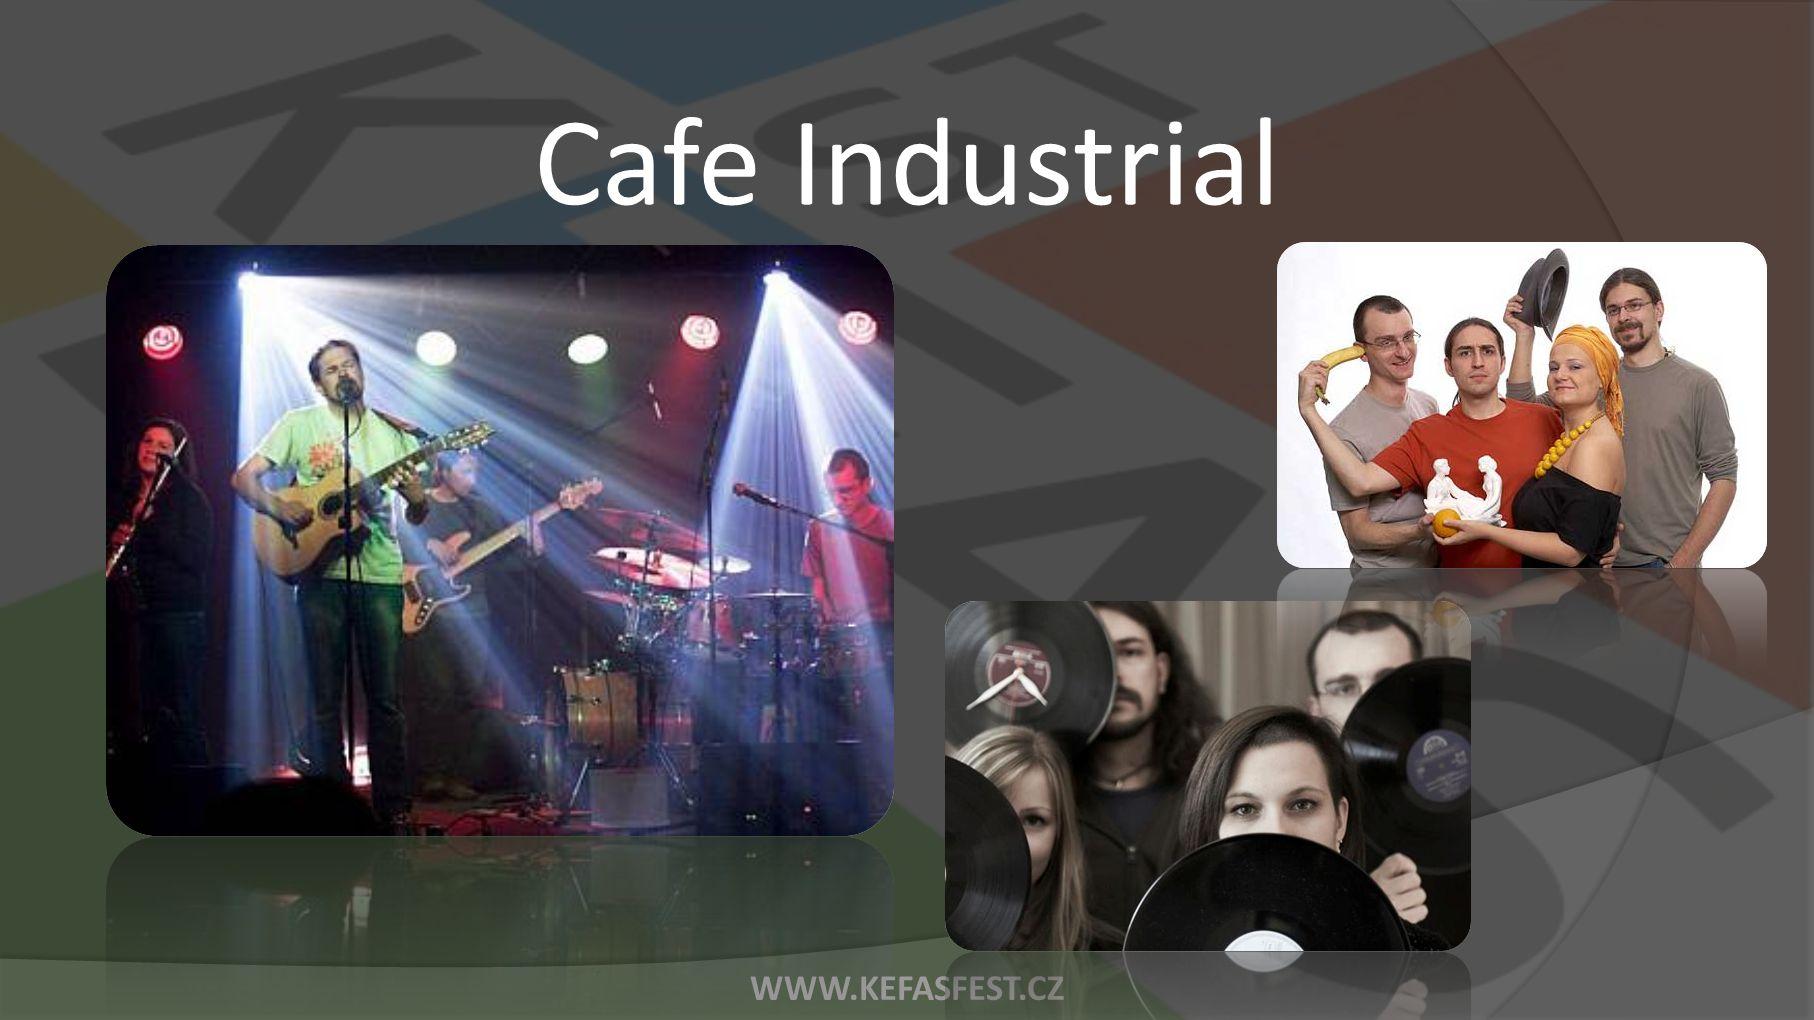 WWW.KEFASFEST.CZ Cafe Industrial